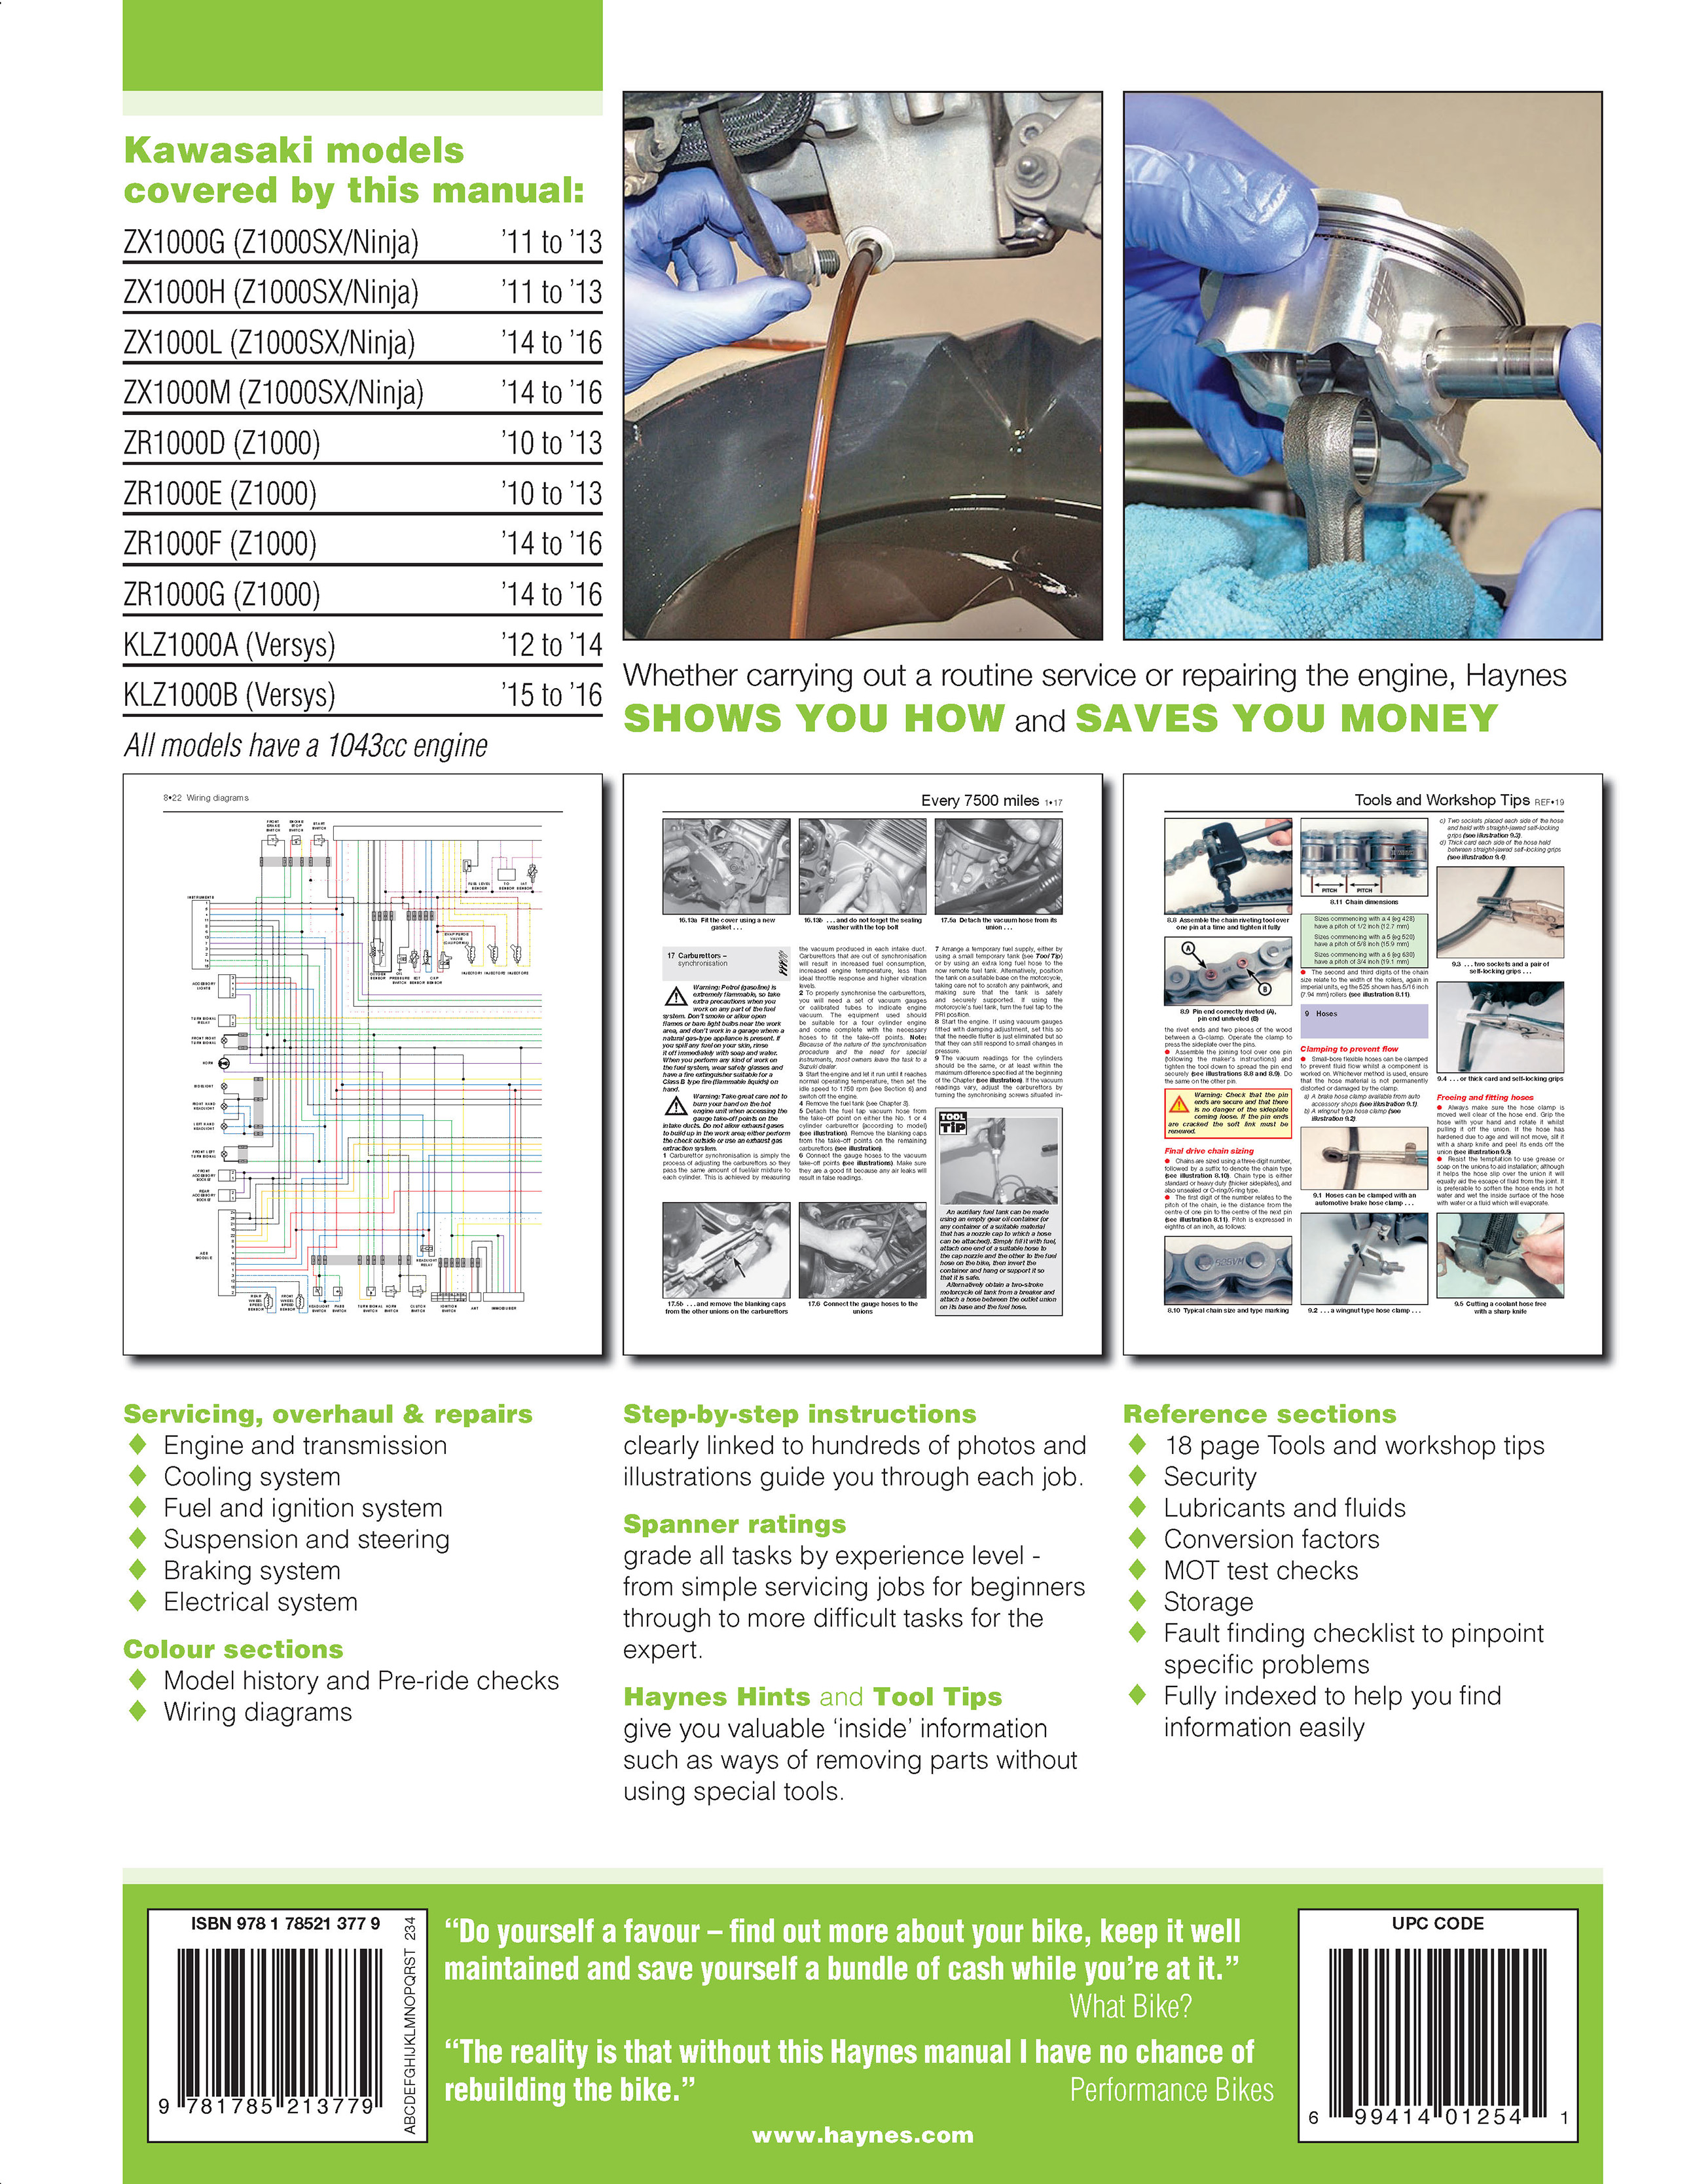 Haynes 6377 back cover kawasaki z1000, z1000sx & versys (10 16) haynes repair manual zg1000 wiring diagram at love-stories.co